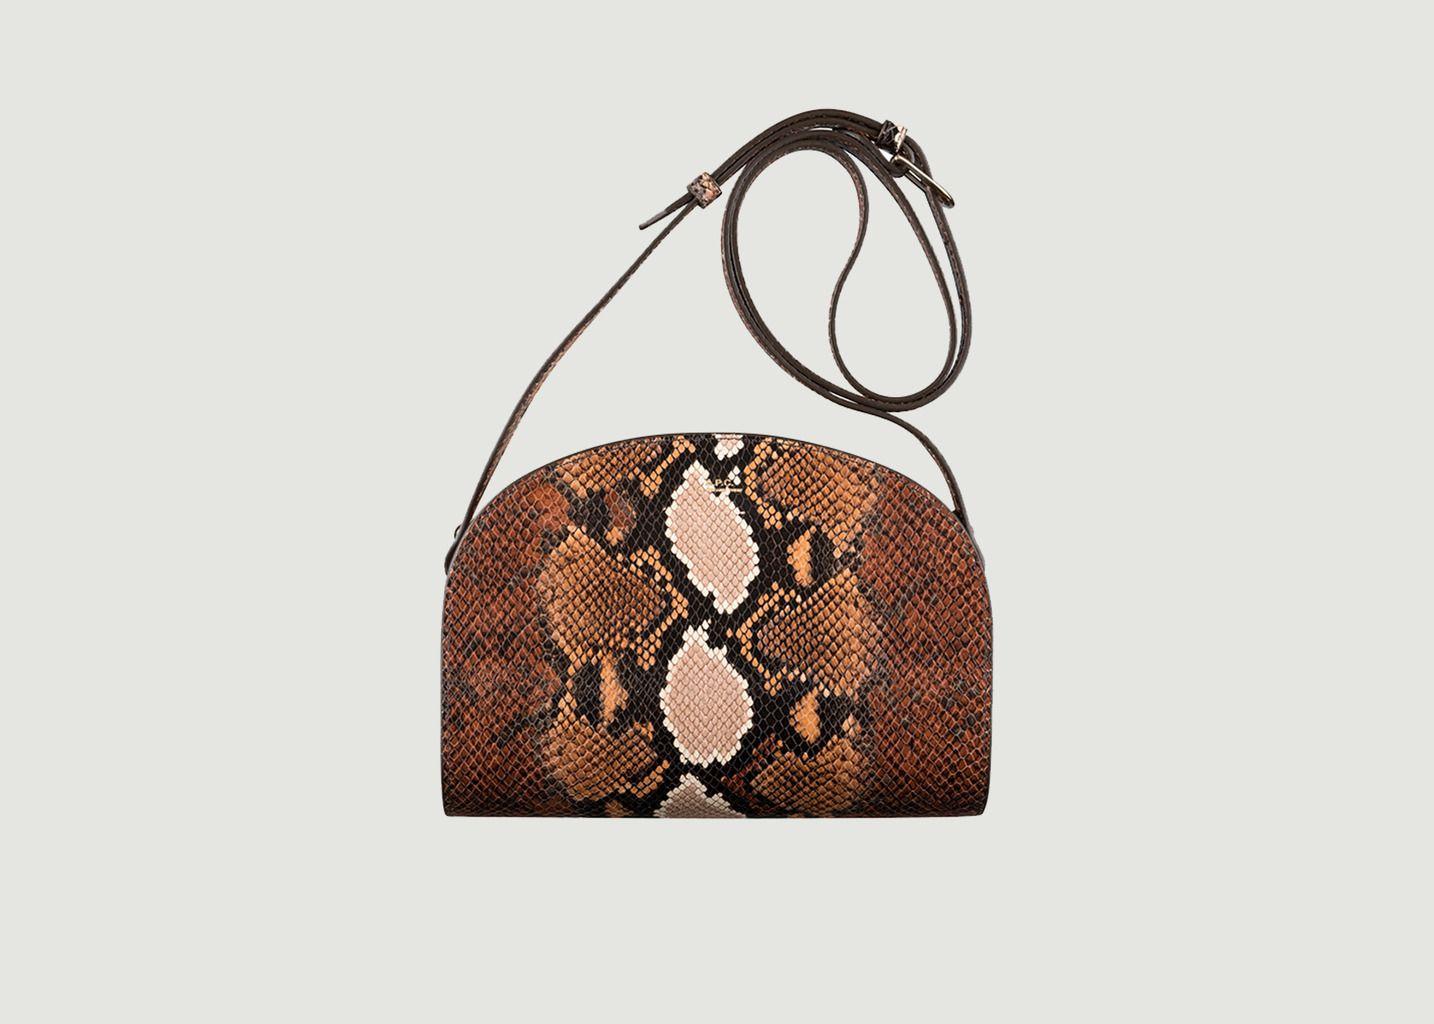 Half Moon Leather Python Embossed Bag - A.P.C.